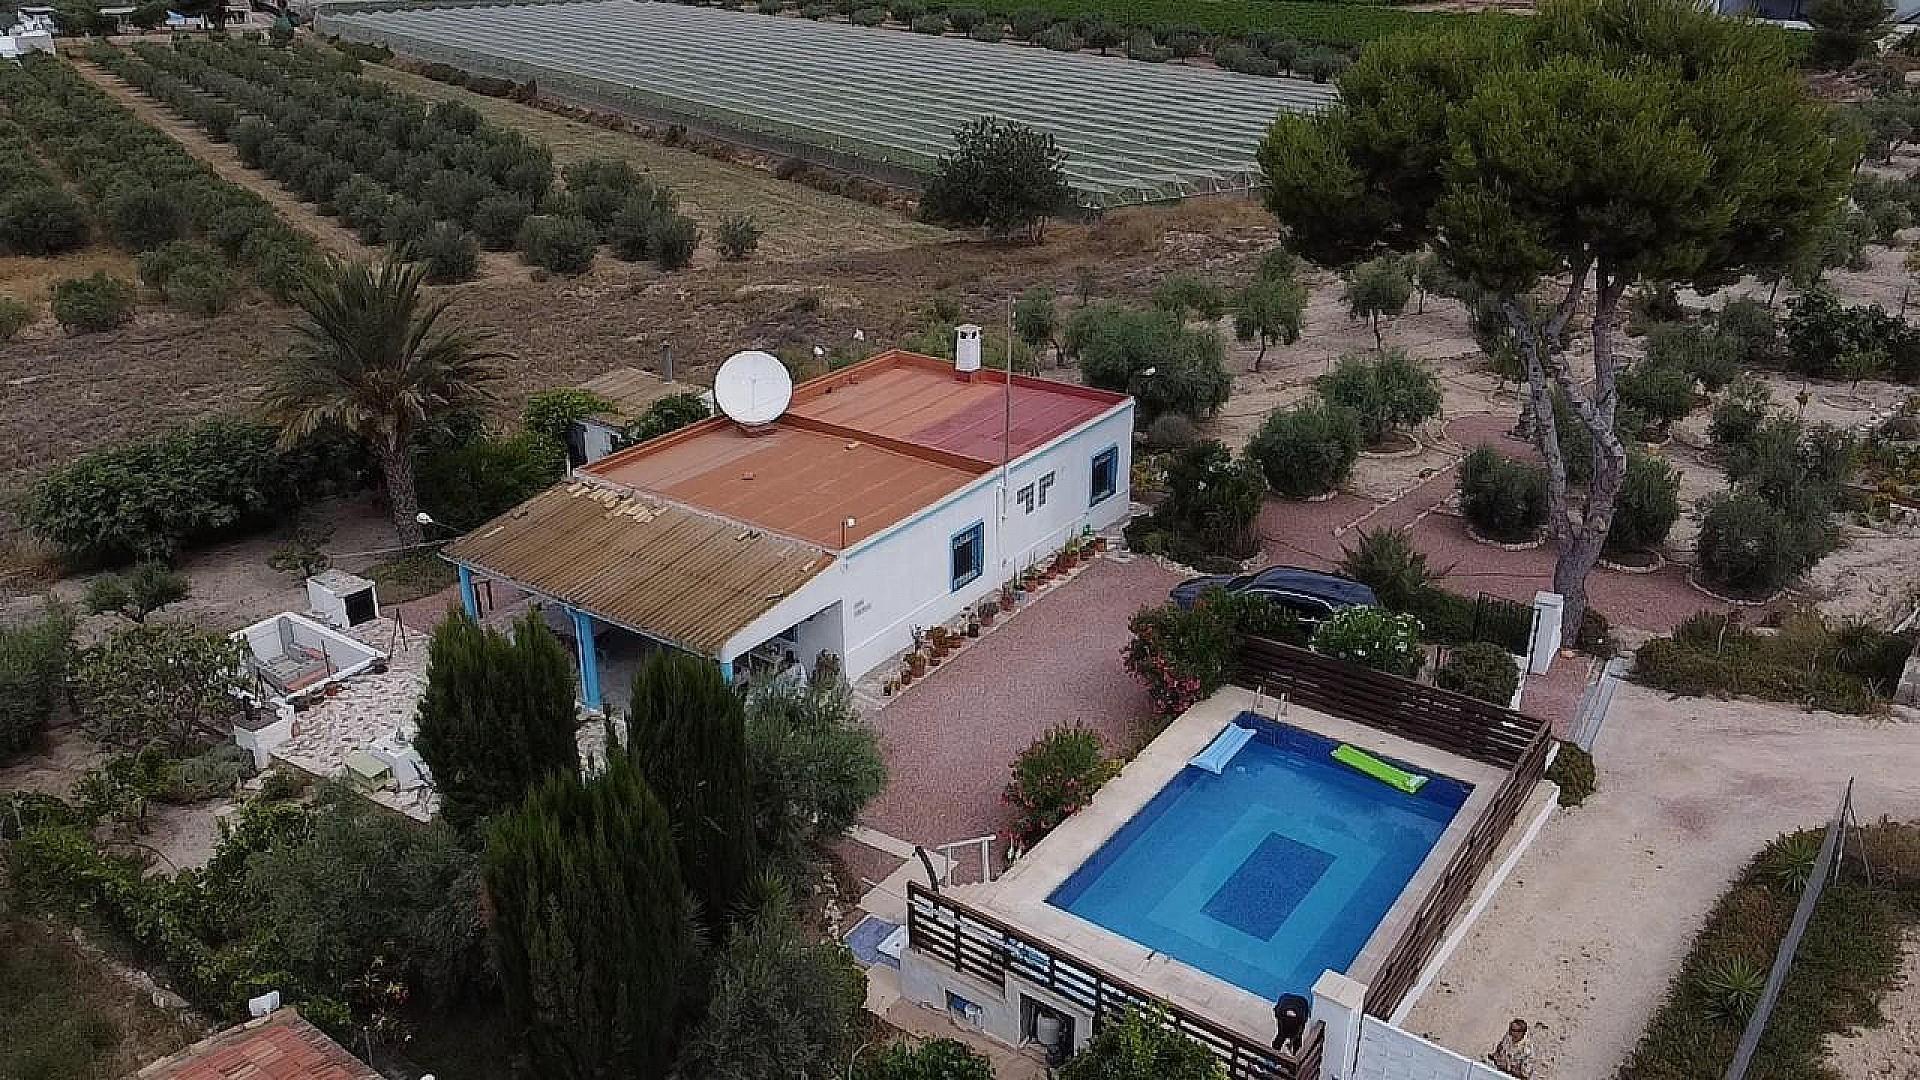 4 bedroom house / villa for sale in Aspe, Costa Blanca